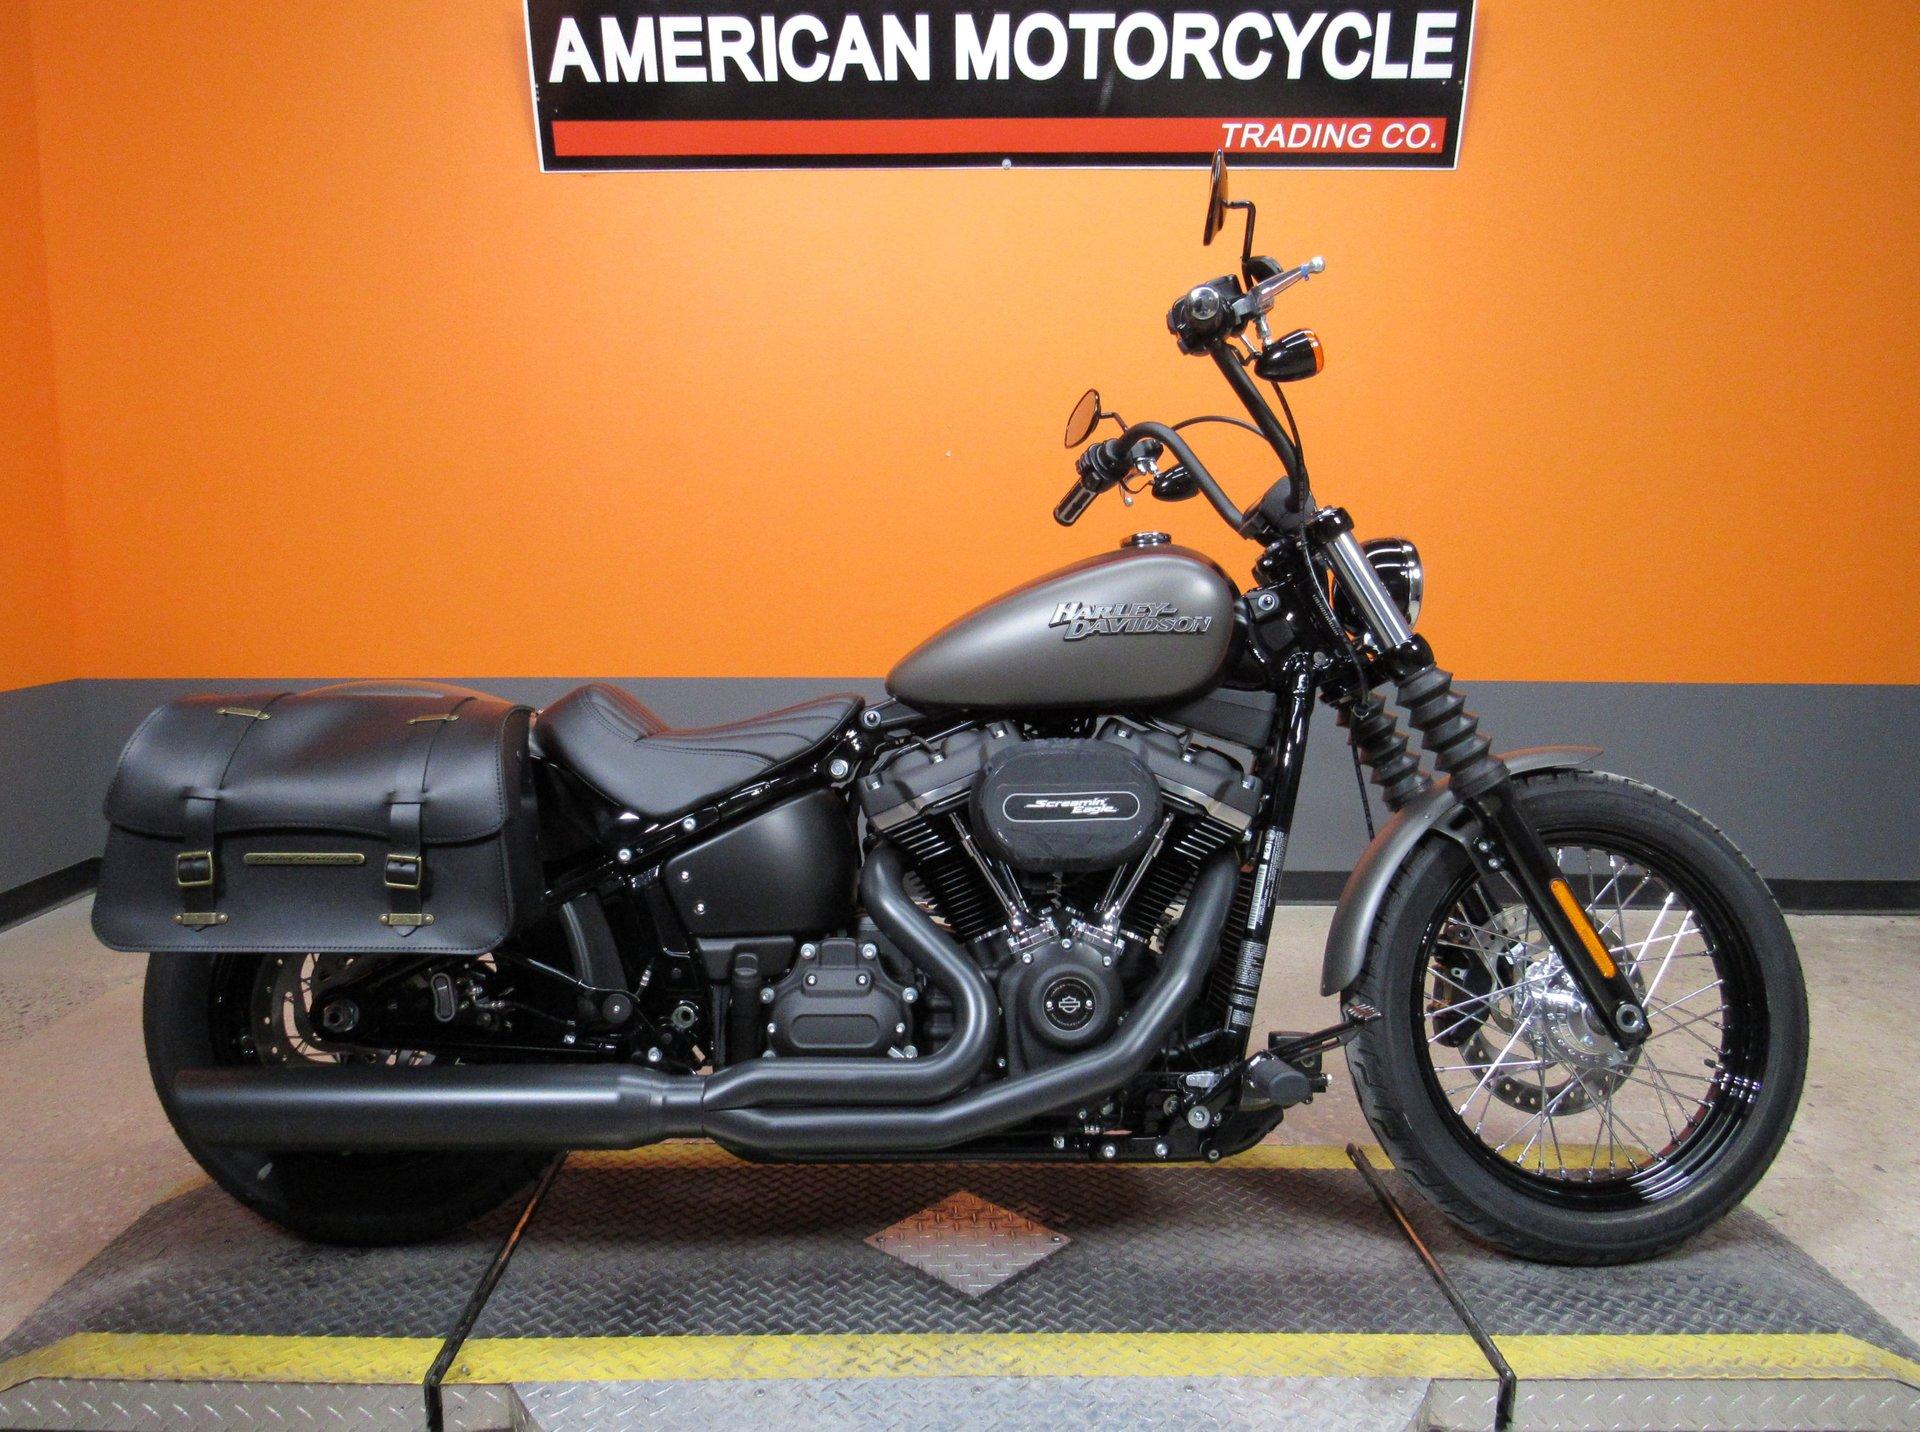 2018 Harley Davidson Softail Street Bob American Motorcycle Trading Company Used Harley Davidson Motorcycles